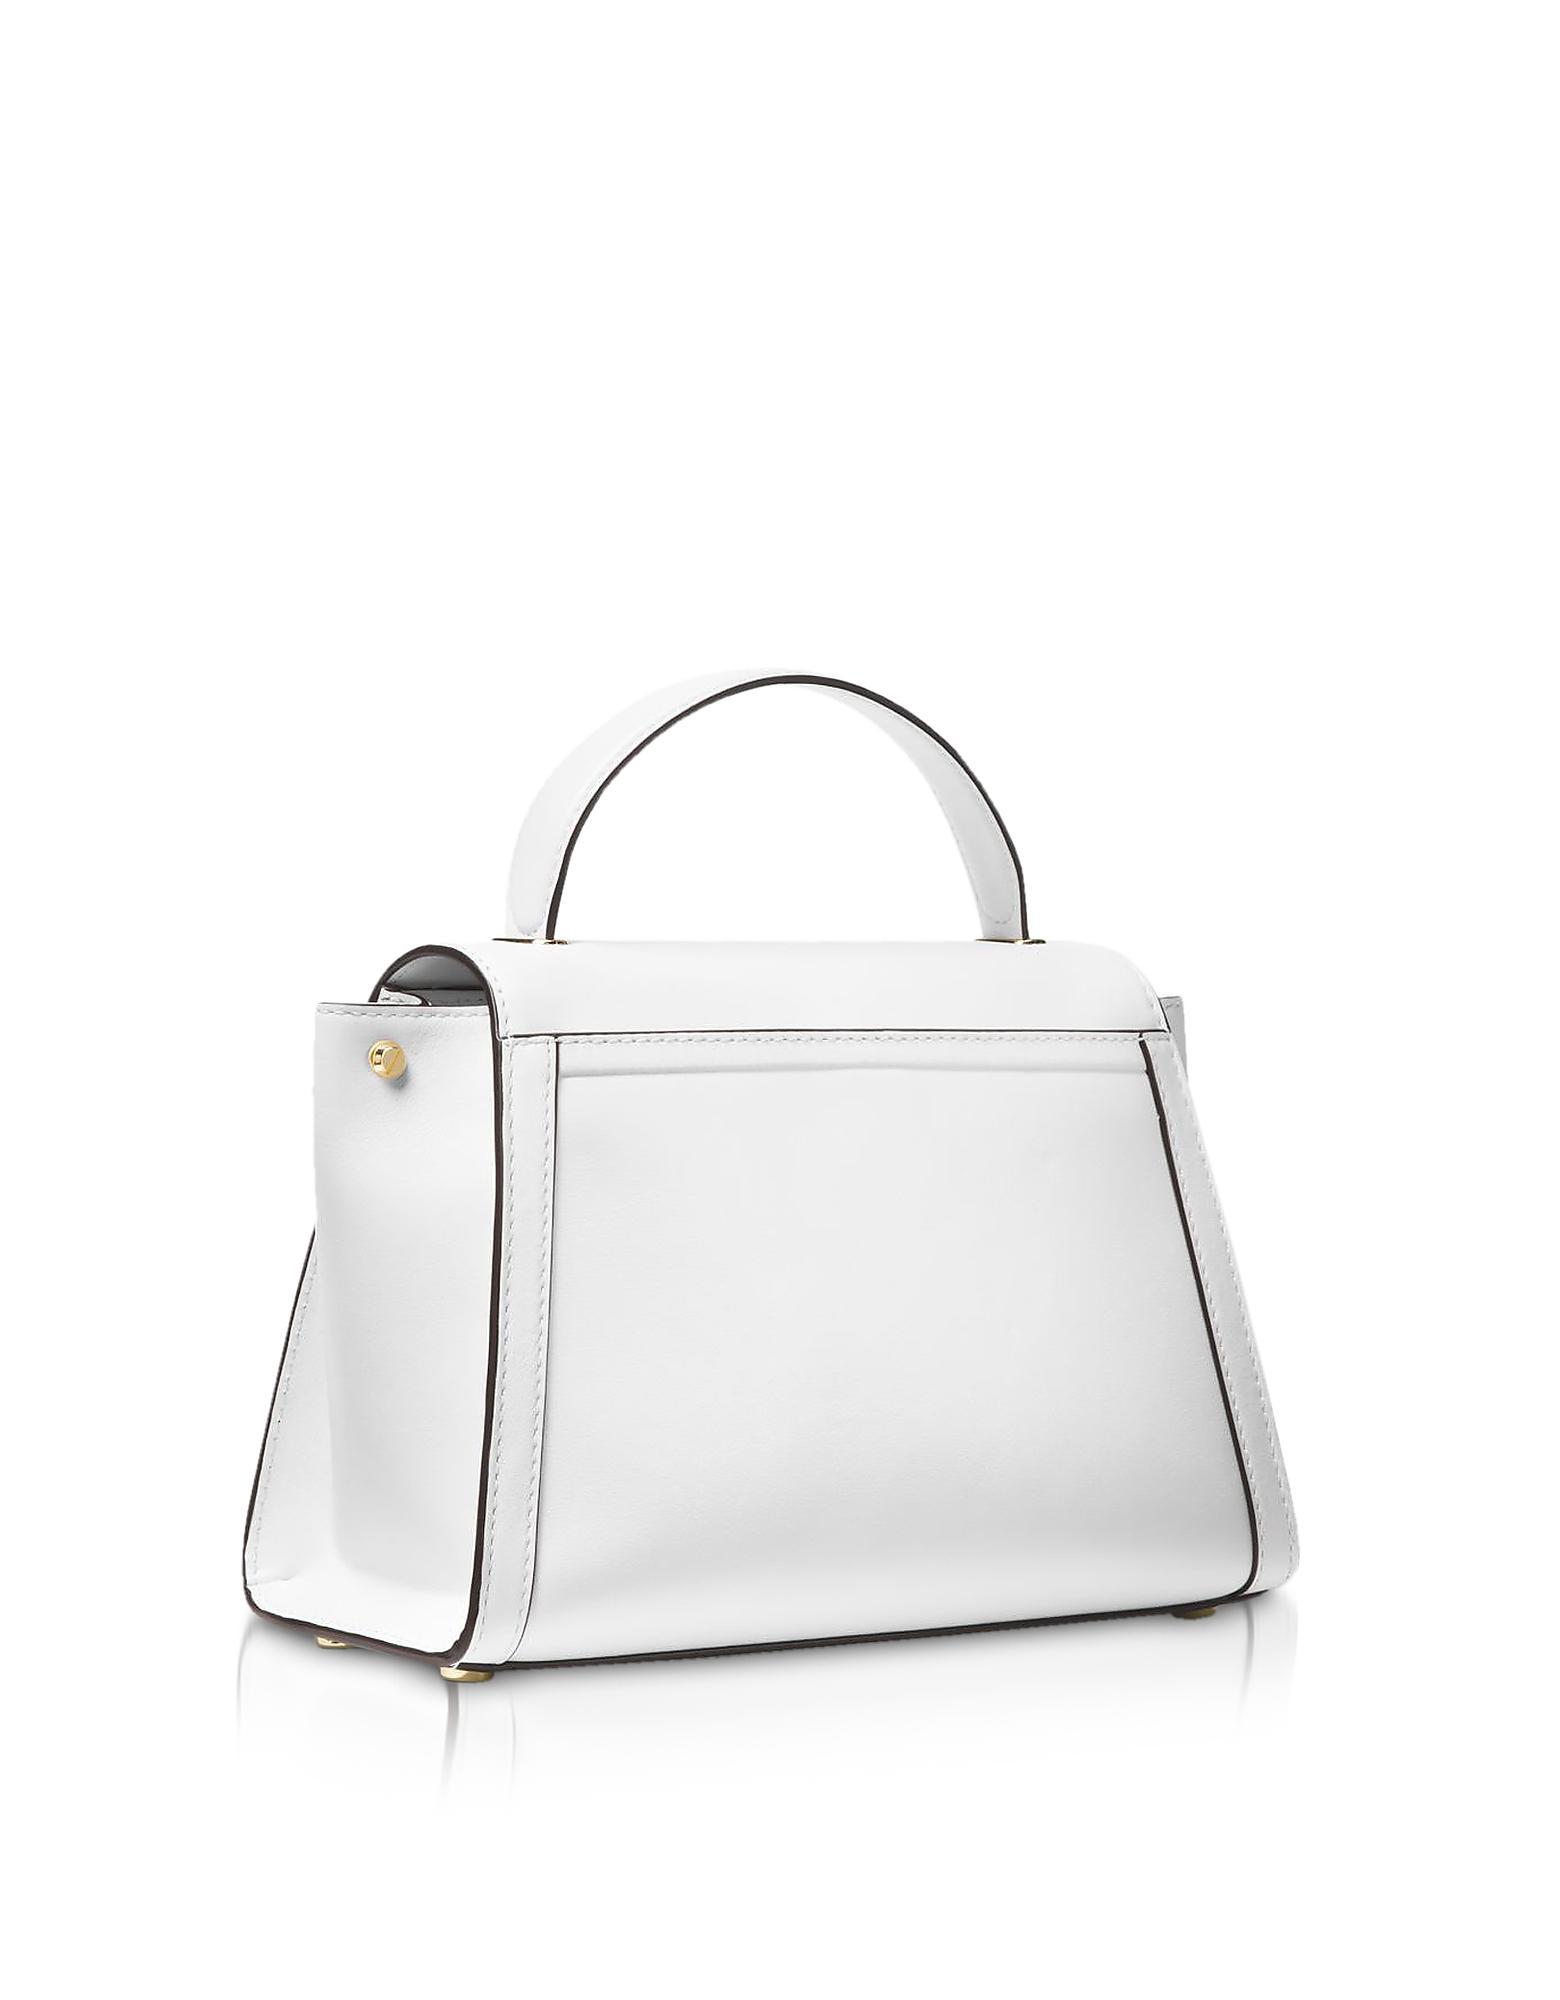 63d6c4bda961 Michael Kors Whitney Medium Leather Satchel in White - Lyst